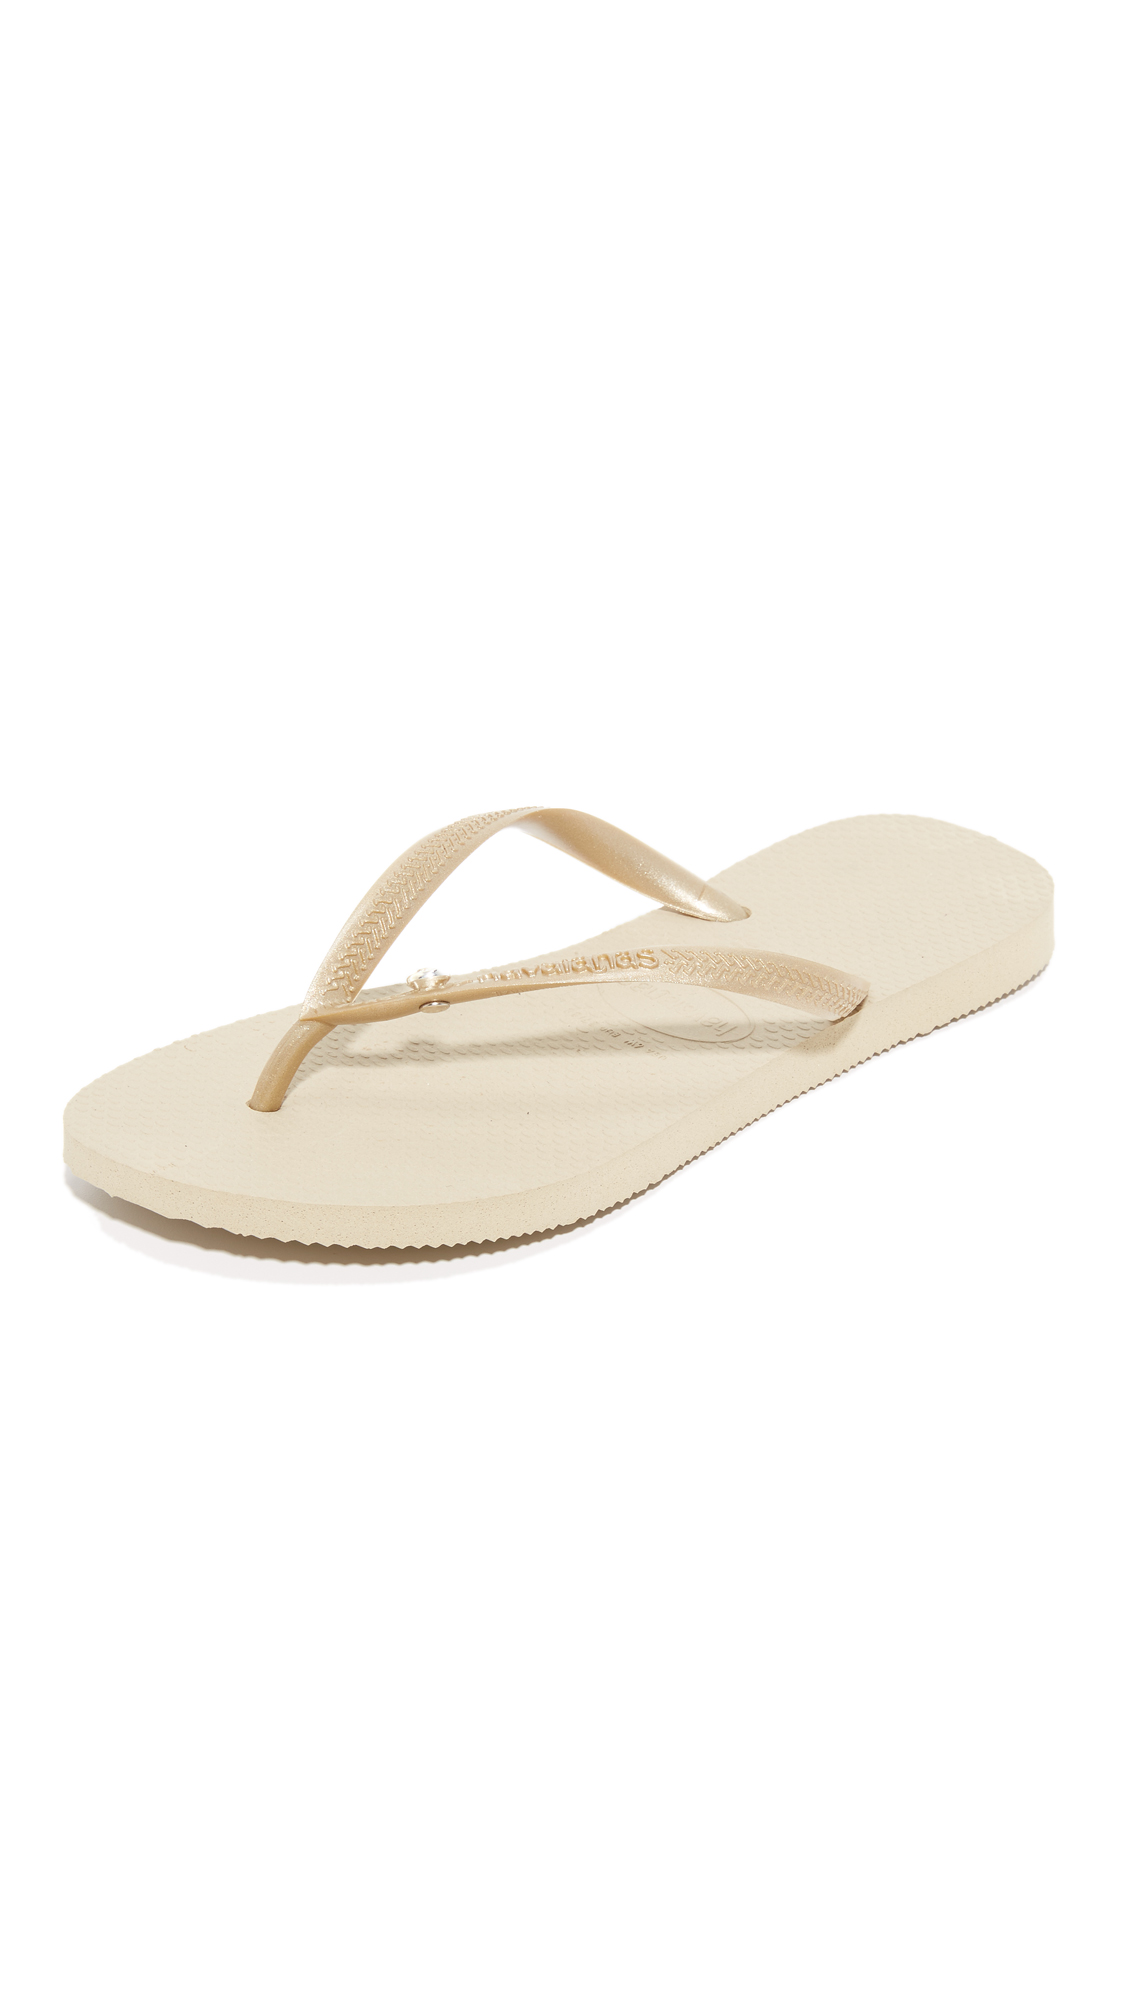 Havaianas Slim Crystal Glamour Flip Flops - Sand Grey/Light Golden at Shopbop